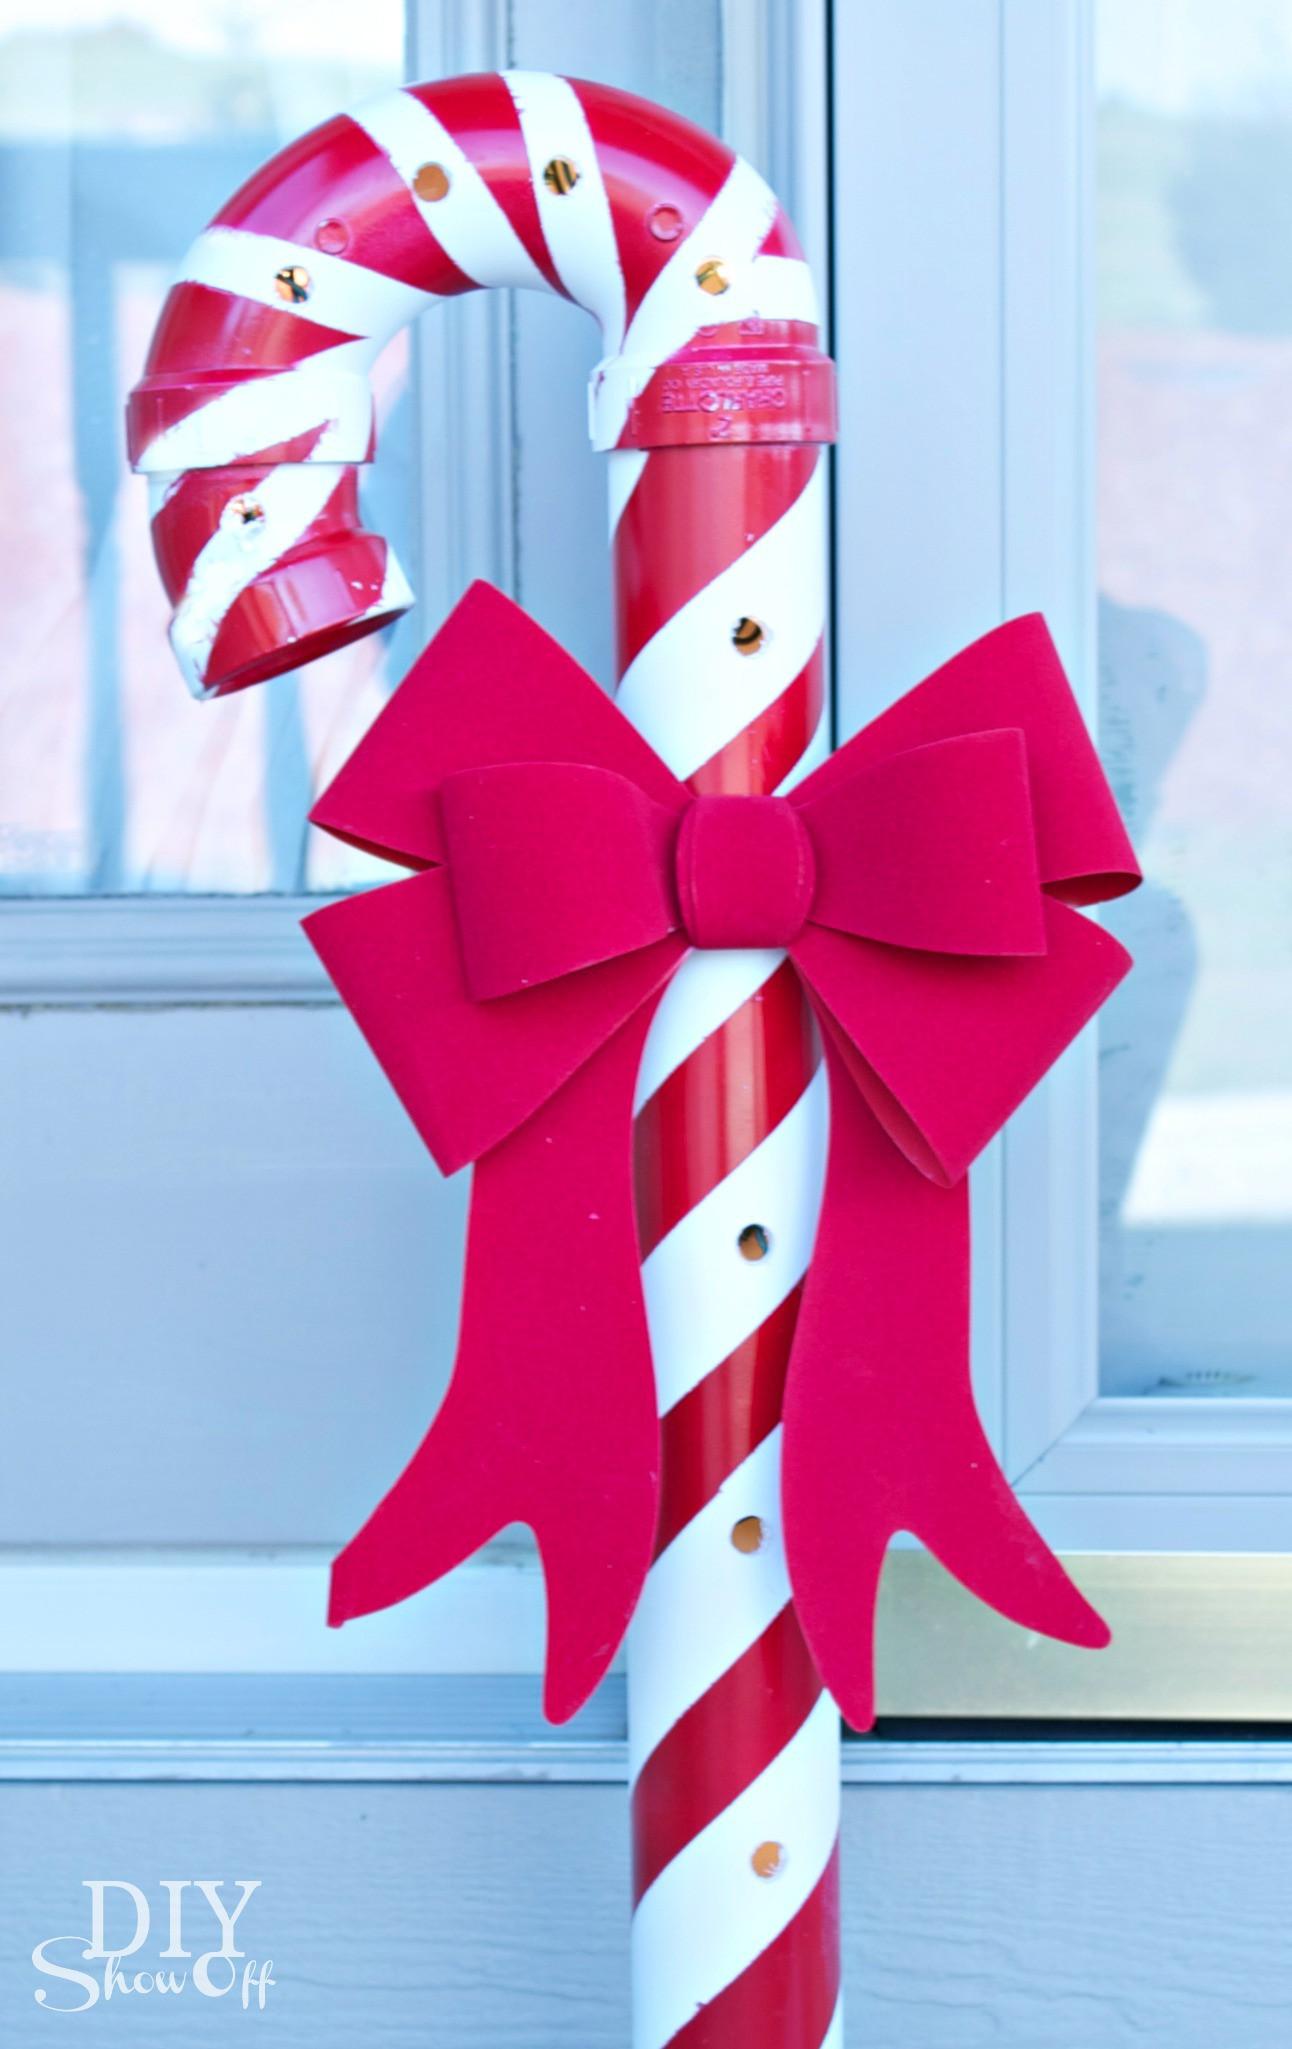 Candy Cane Christmas  Lighted PVC Candy Canes DIY Christmas Home Decor DIY